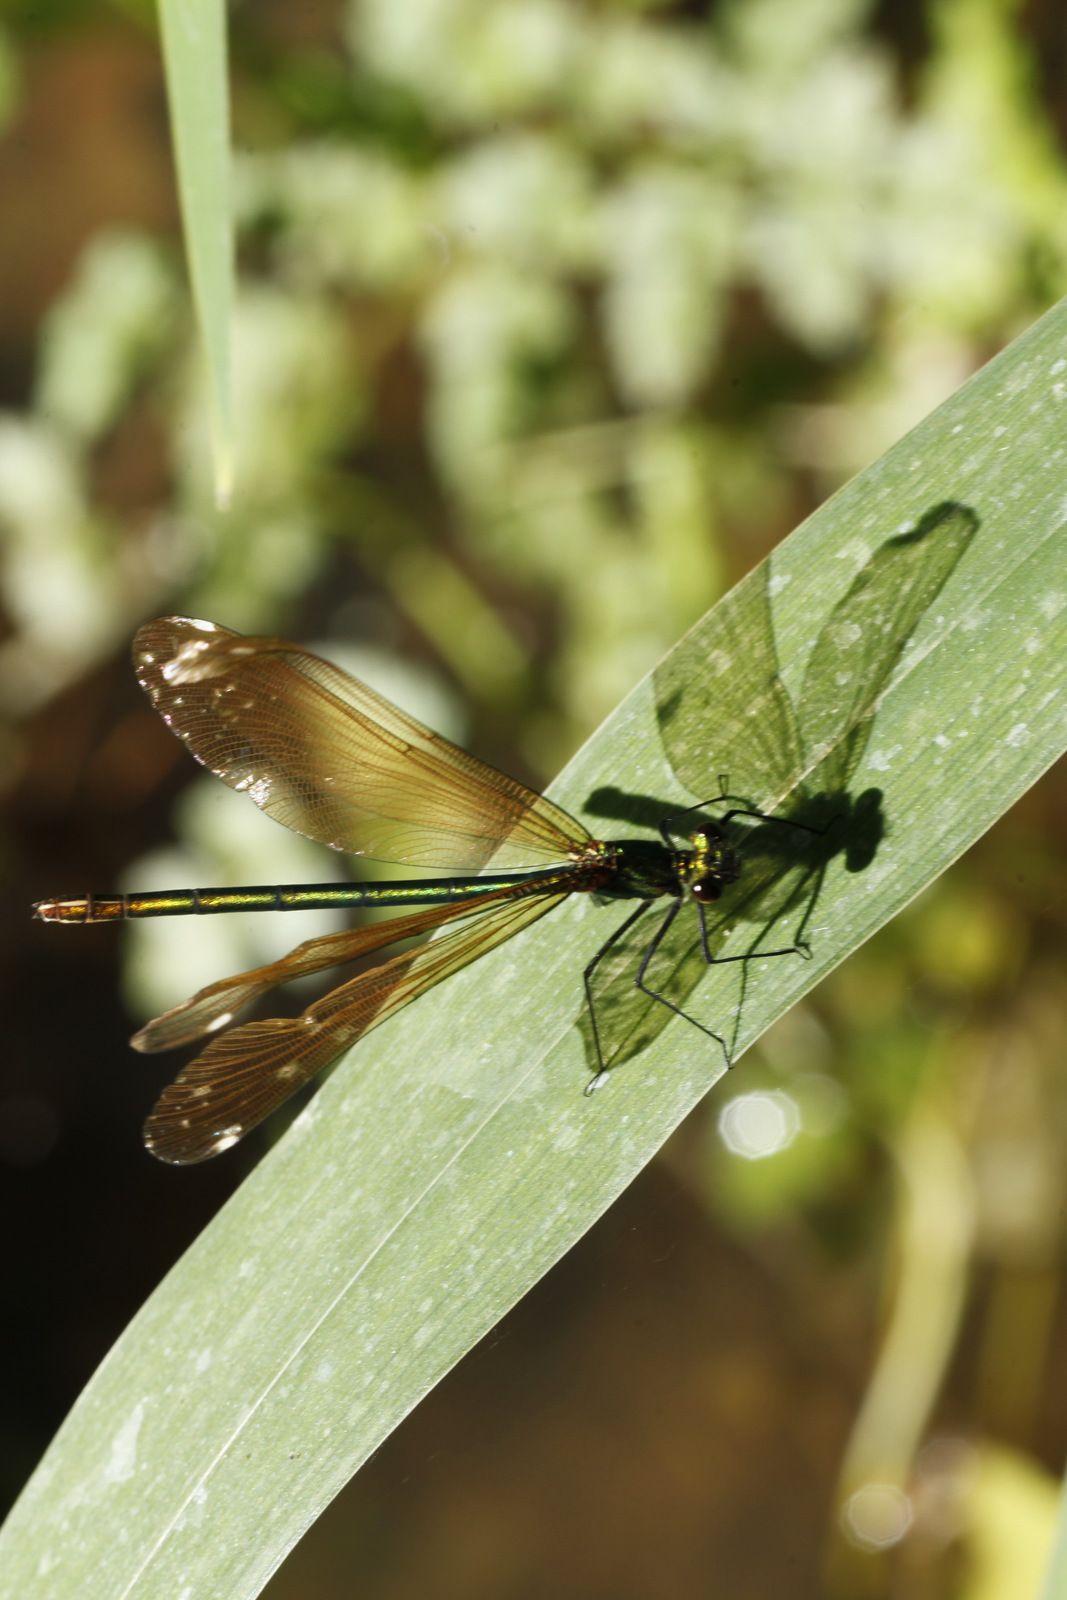 Calopteryx virgo femelle, Pont Gaulois, Crozon. Photographie lavieb-aile 30 mai 2020.